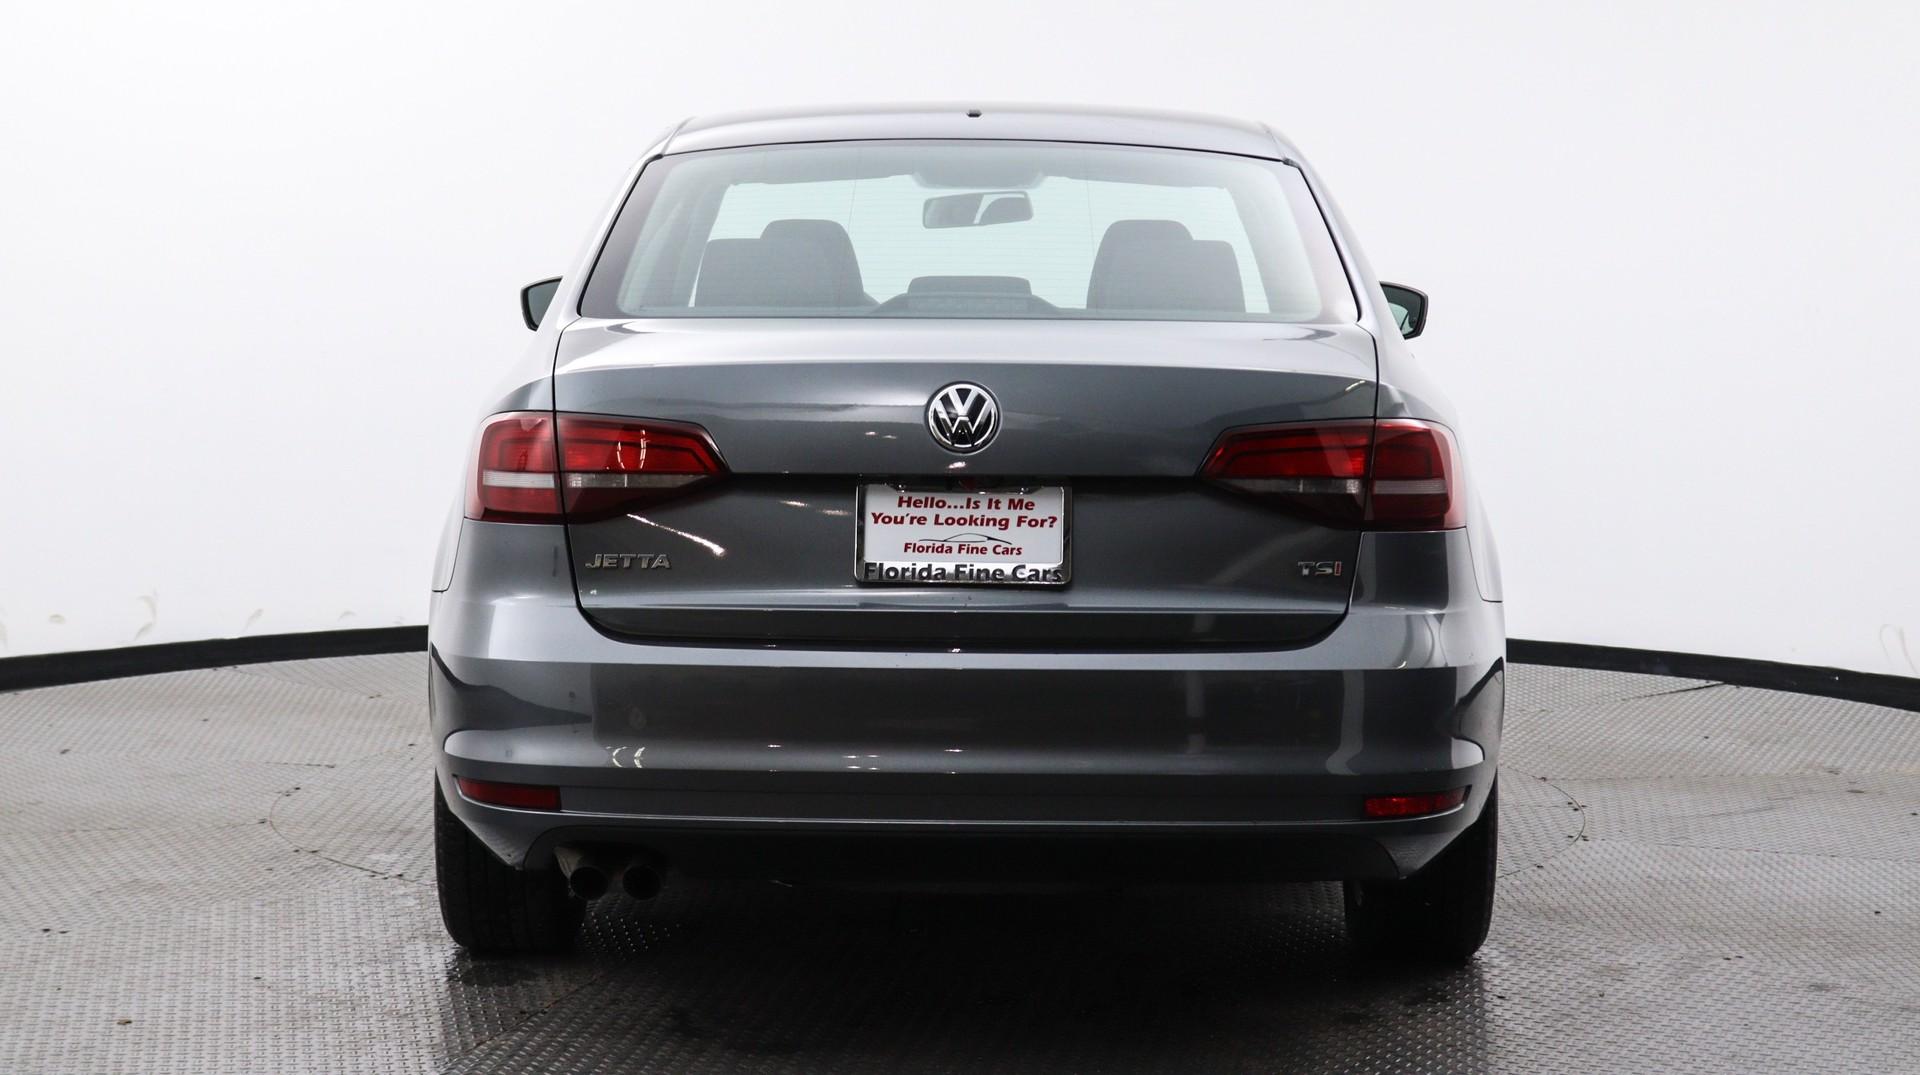 Florida Fine Cars - Used vehicle - Sedan VOLKSWAGEN JETTA 2018